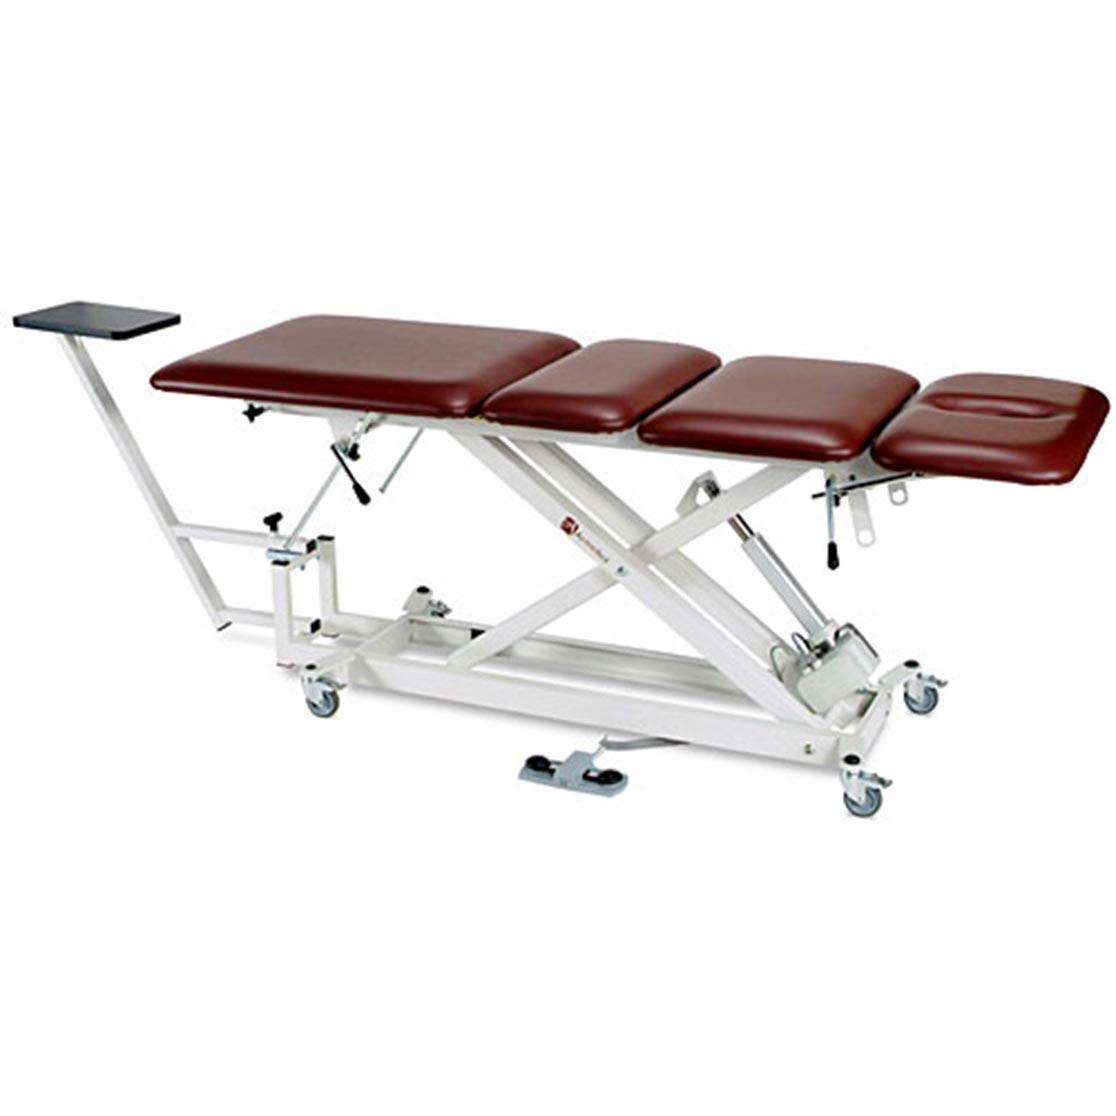 Armedica AM-SX 4000 treatment table